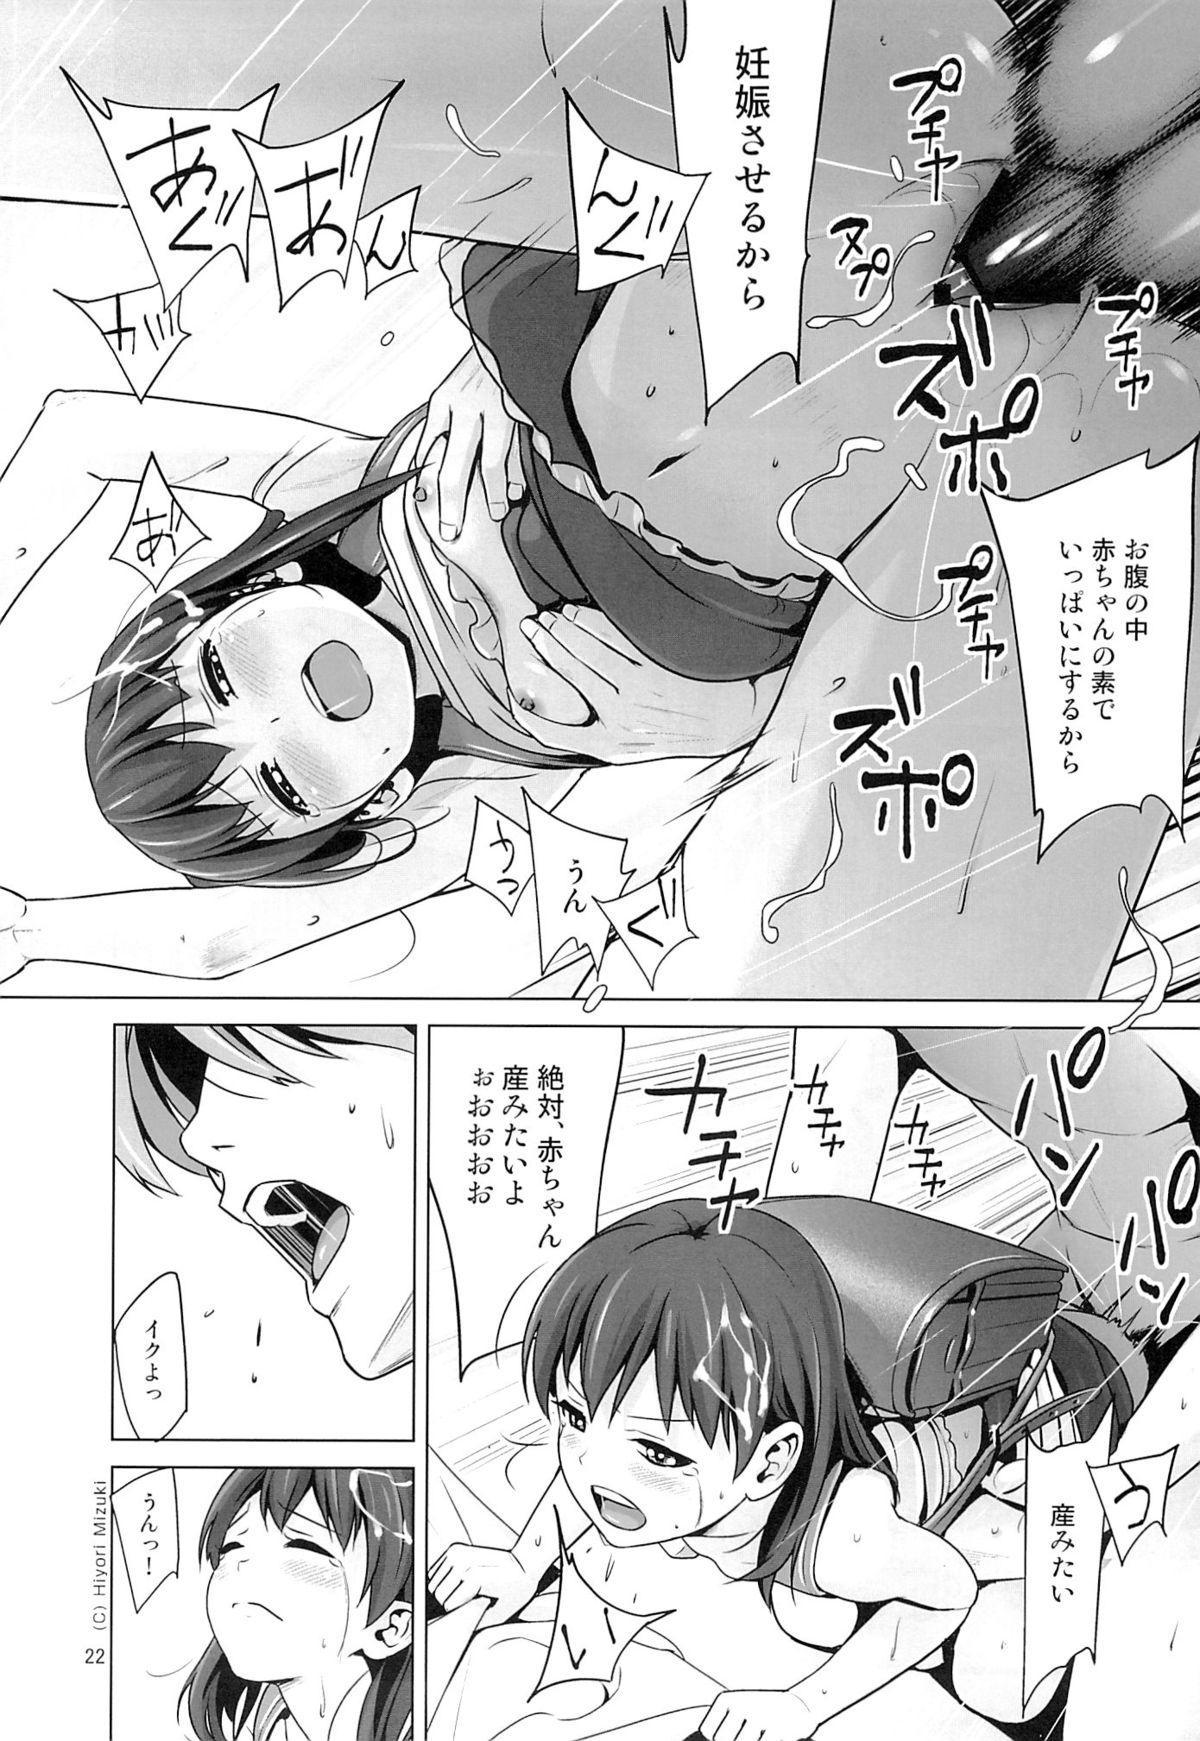 Hairo-ism Sukumizu Syndrome Vol. 0 22